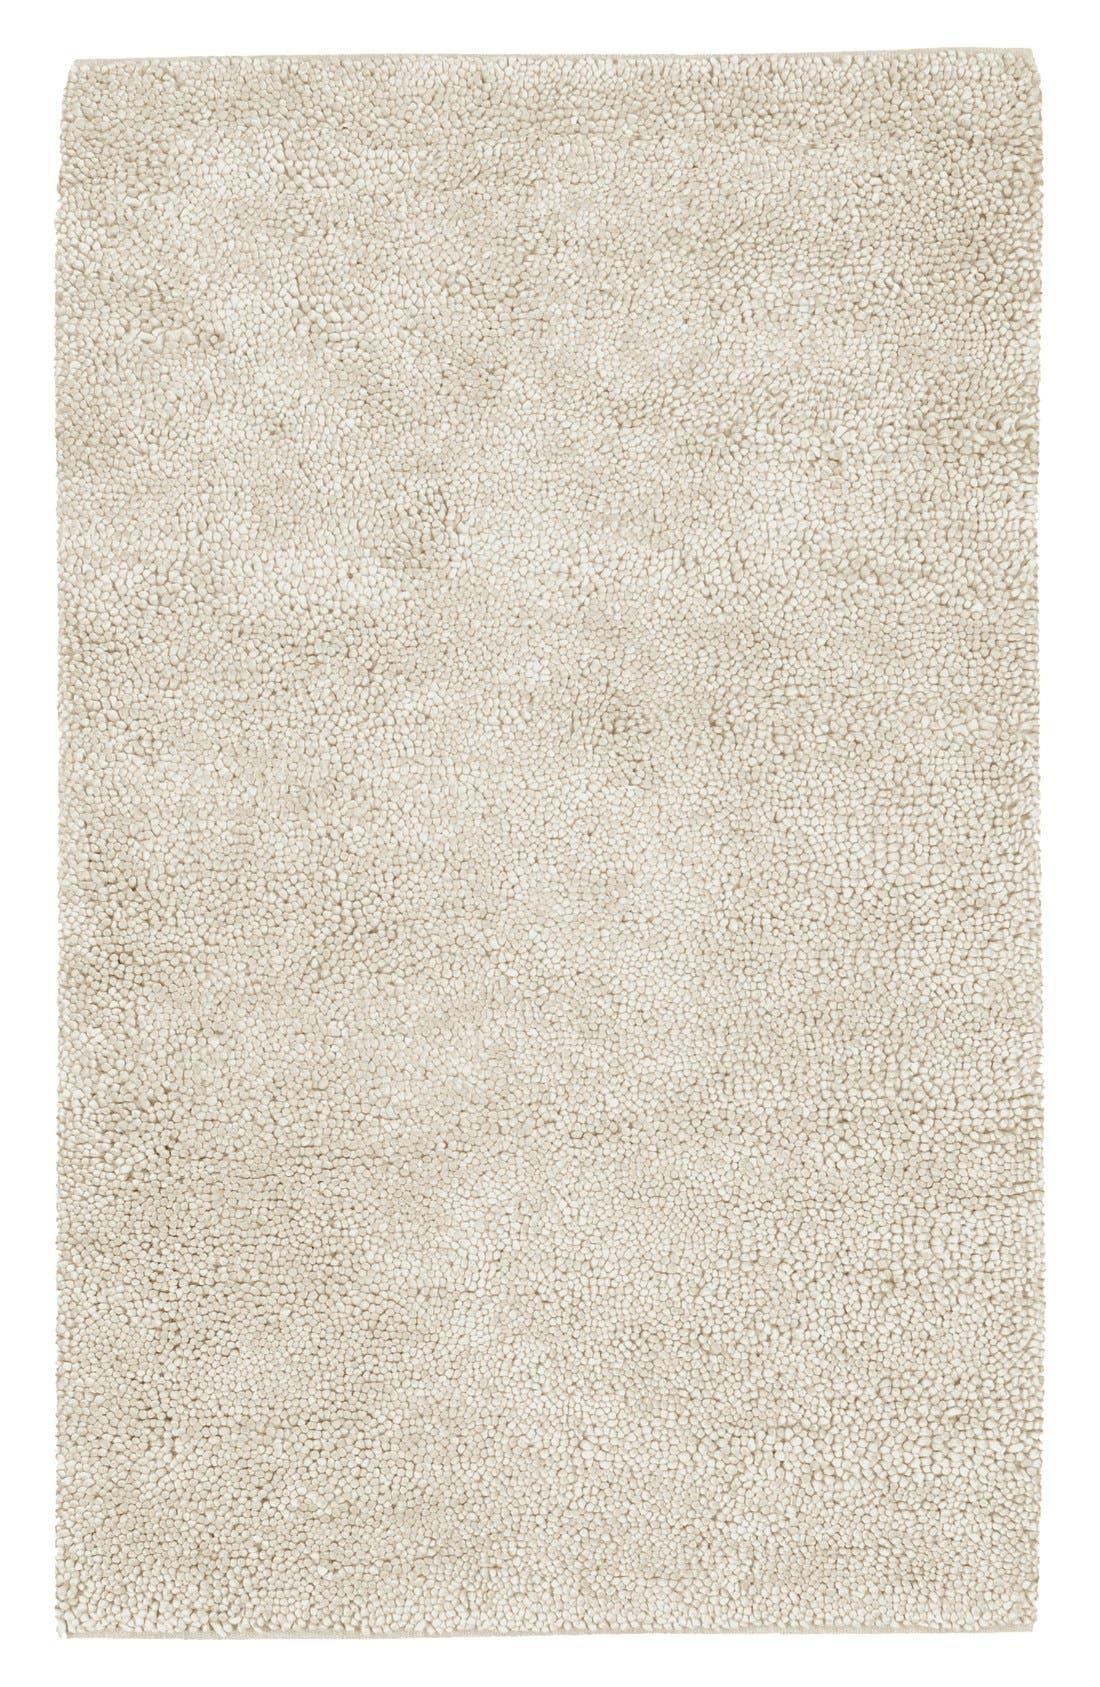 'Aros' Wool Rug,                             Main thumbnail 1, color,                             IVORY